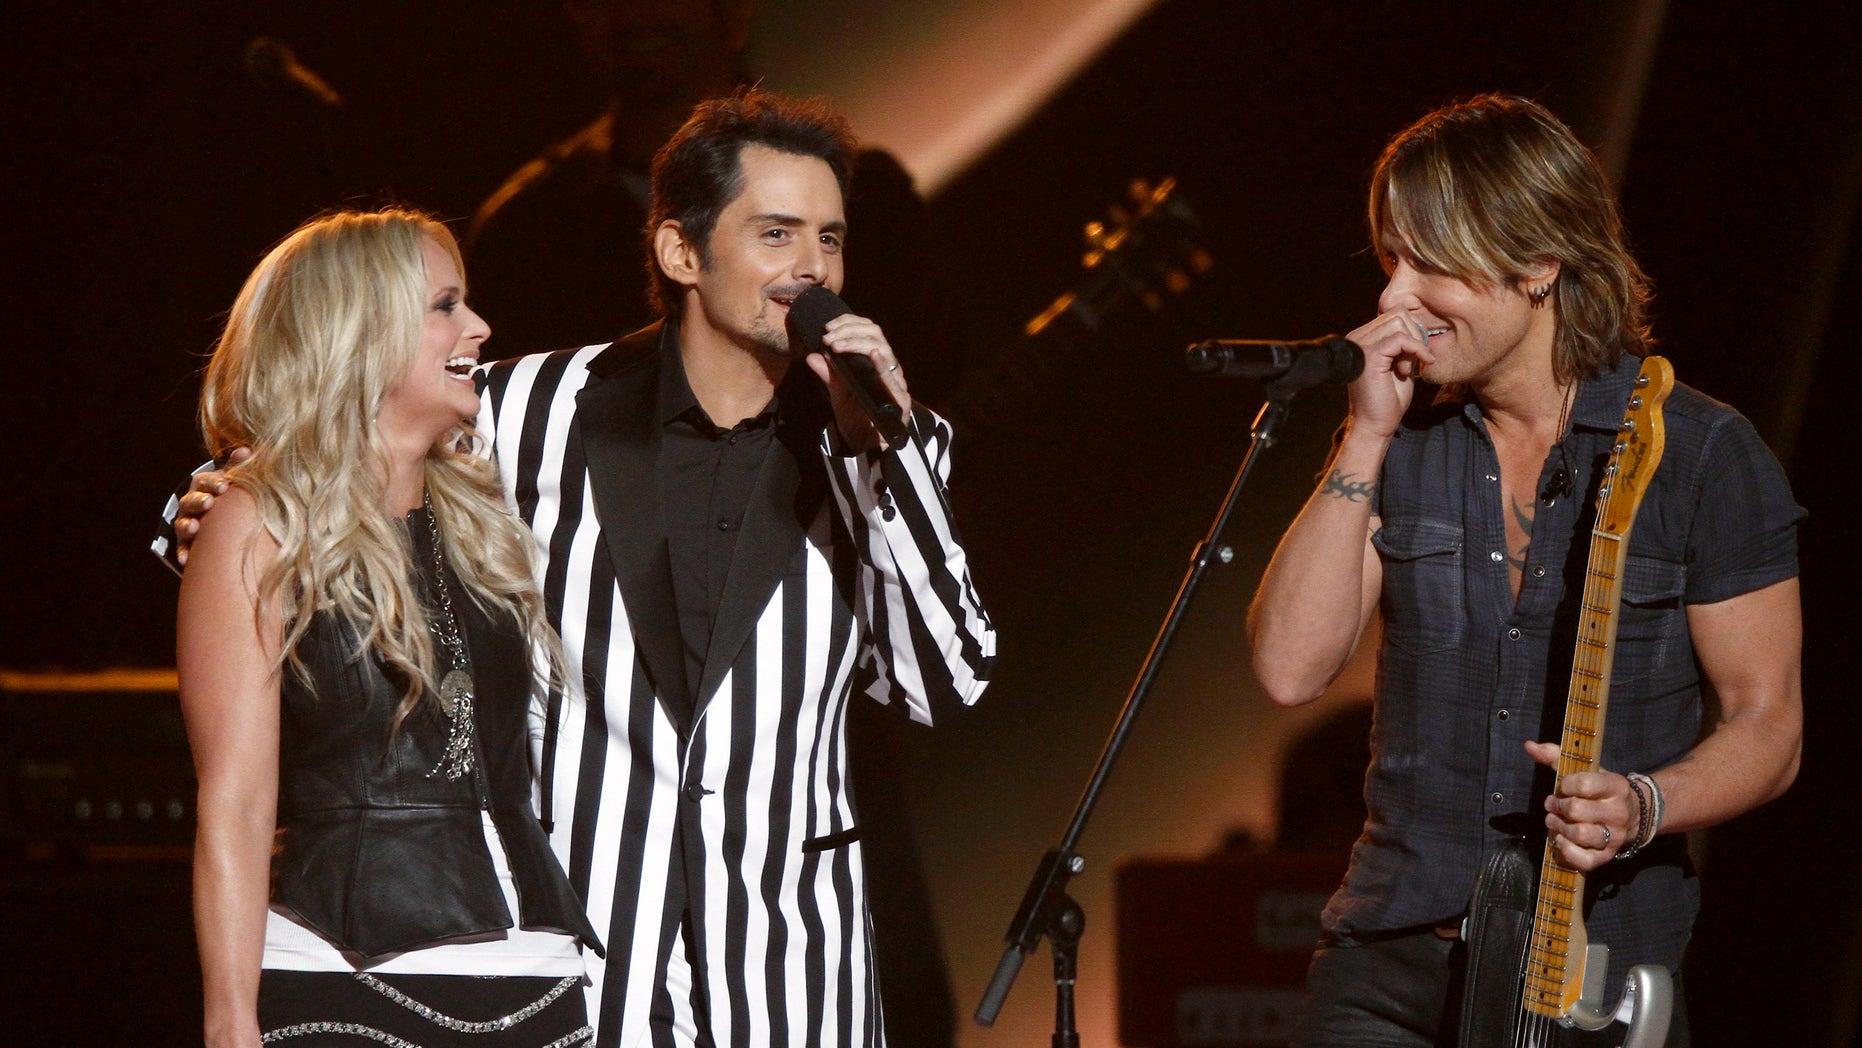 Miranda Lambert, left, Brad Paisley, center, and Keith Urban appear onstage at the 47th annual CMA Awards at Bridgestone Arena on Wednesday, Nov. 6, 2013, in Nashville, Tenn. (Photo by Wade Payne/Invision/AP)